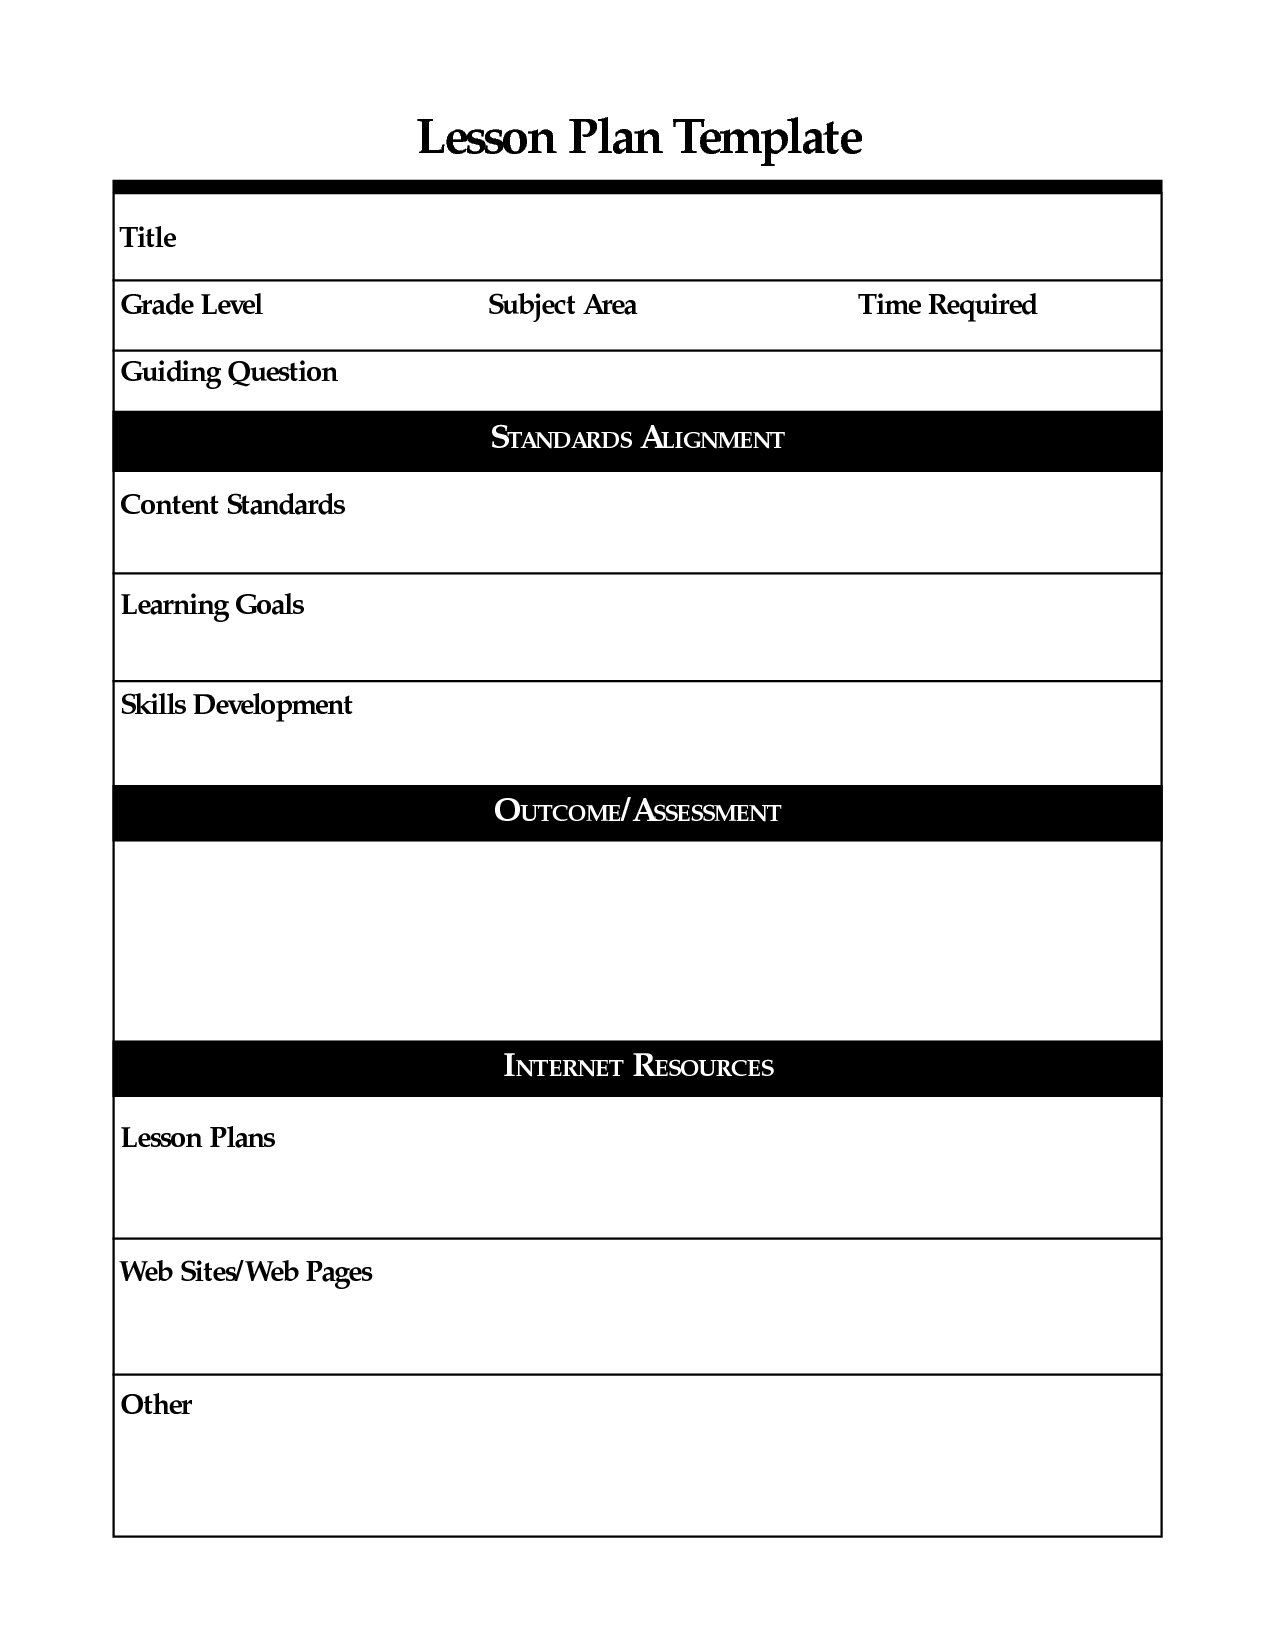 FREE to use Printable Lesson Plan Template | Teaching | Pinterest ...